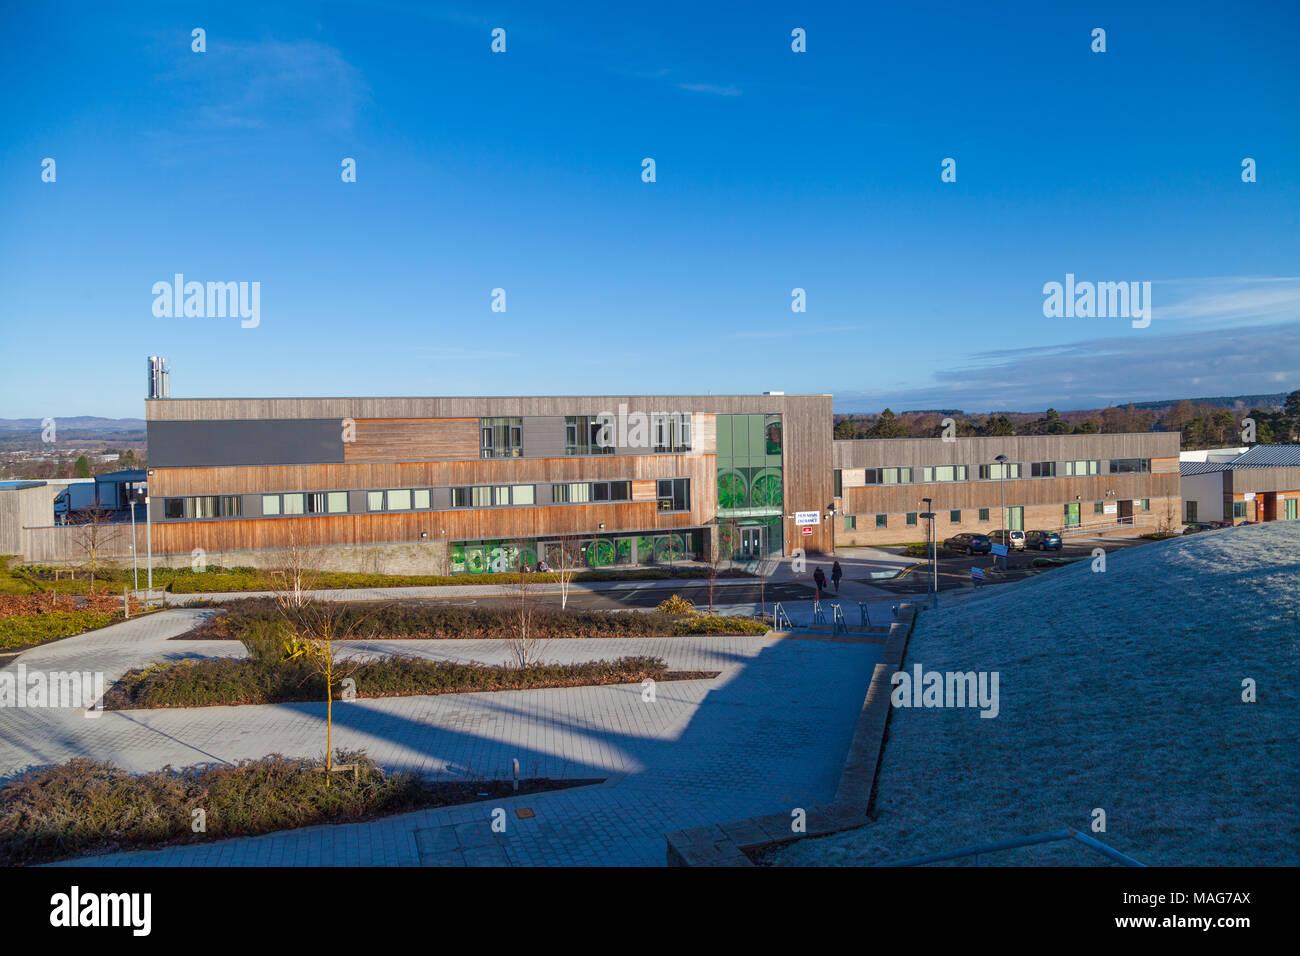 Murray Royal psychiatric Hospital, Perth Scotland. - Stock Image